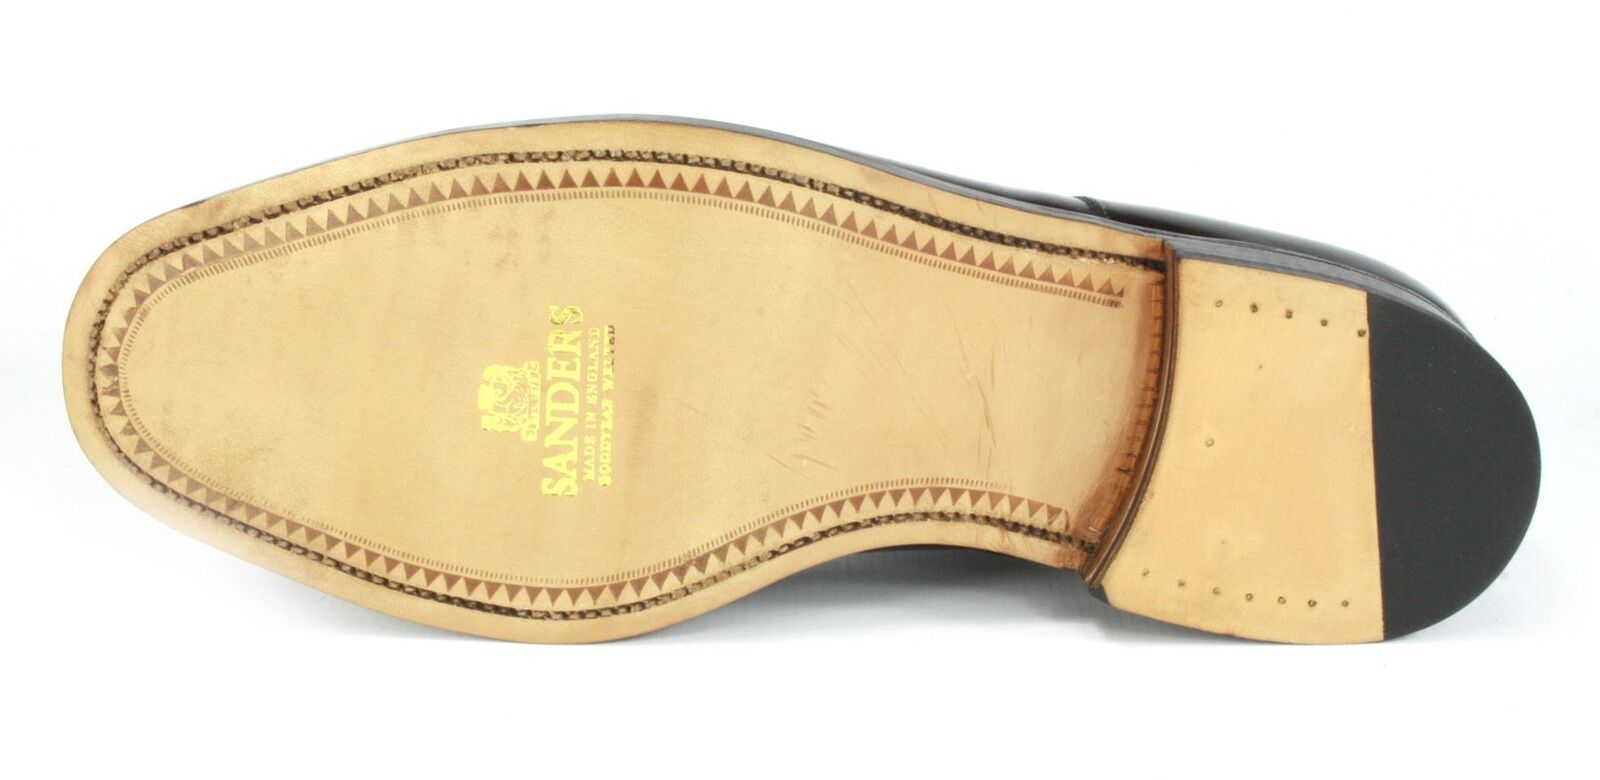 Charles Horrel Britisch Herren handgefertigt rahmengenähte Herren Britisch Leder Kappe 60352e